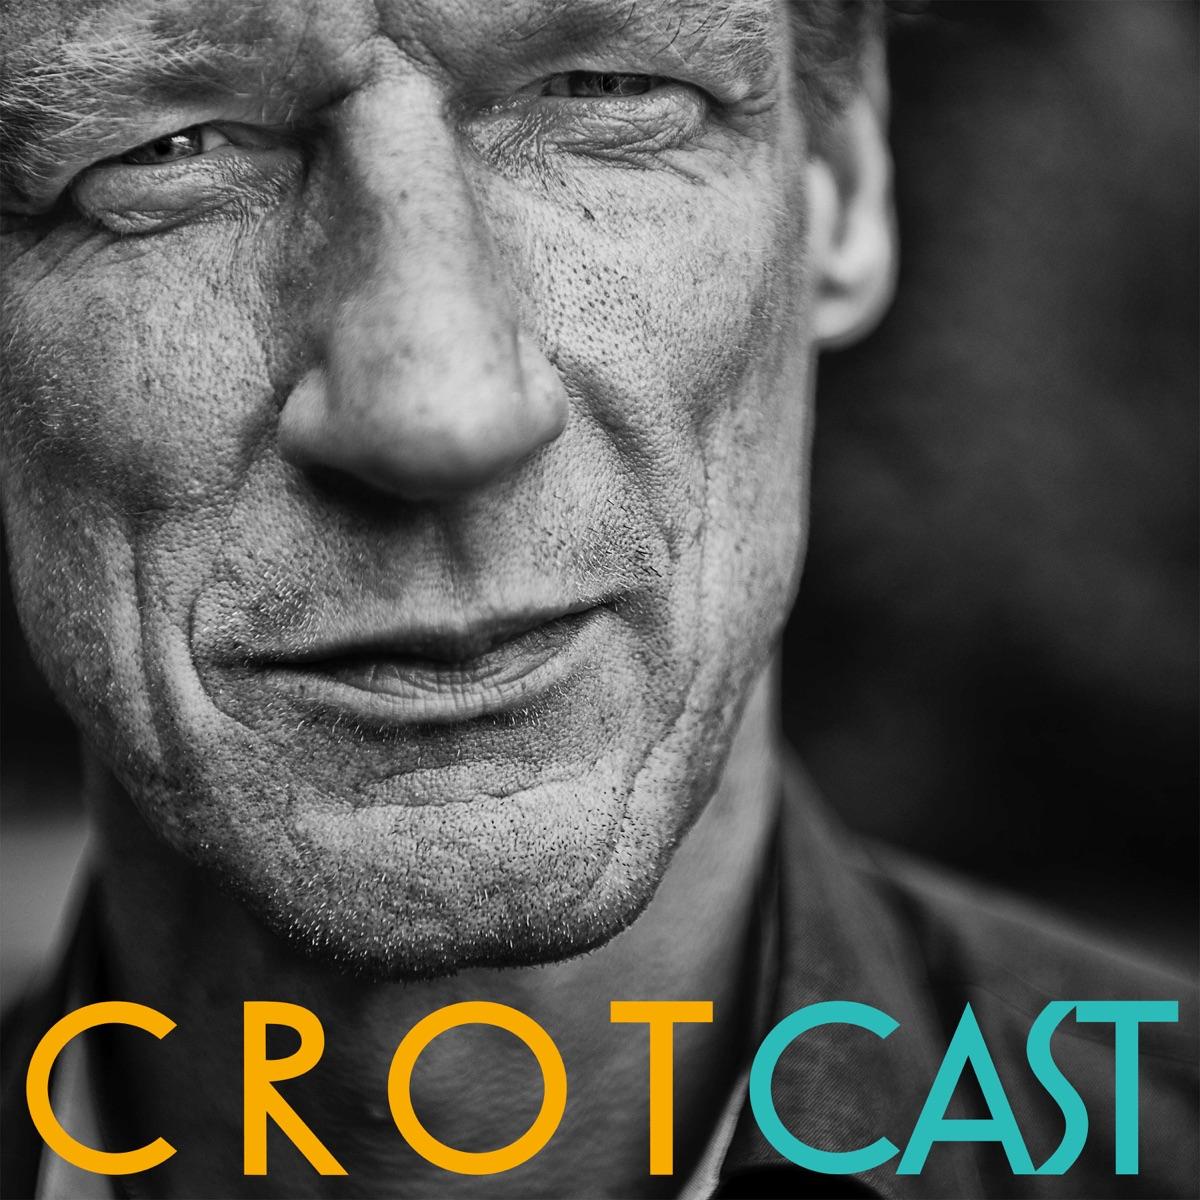 Crotcast